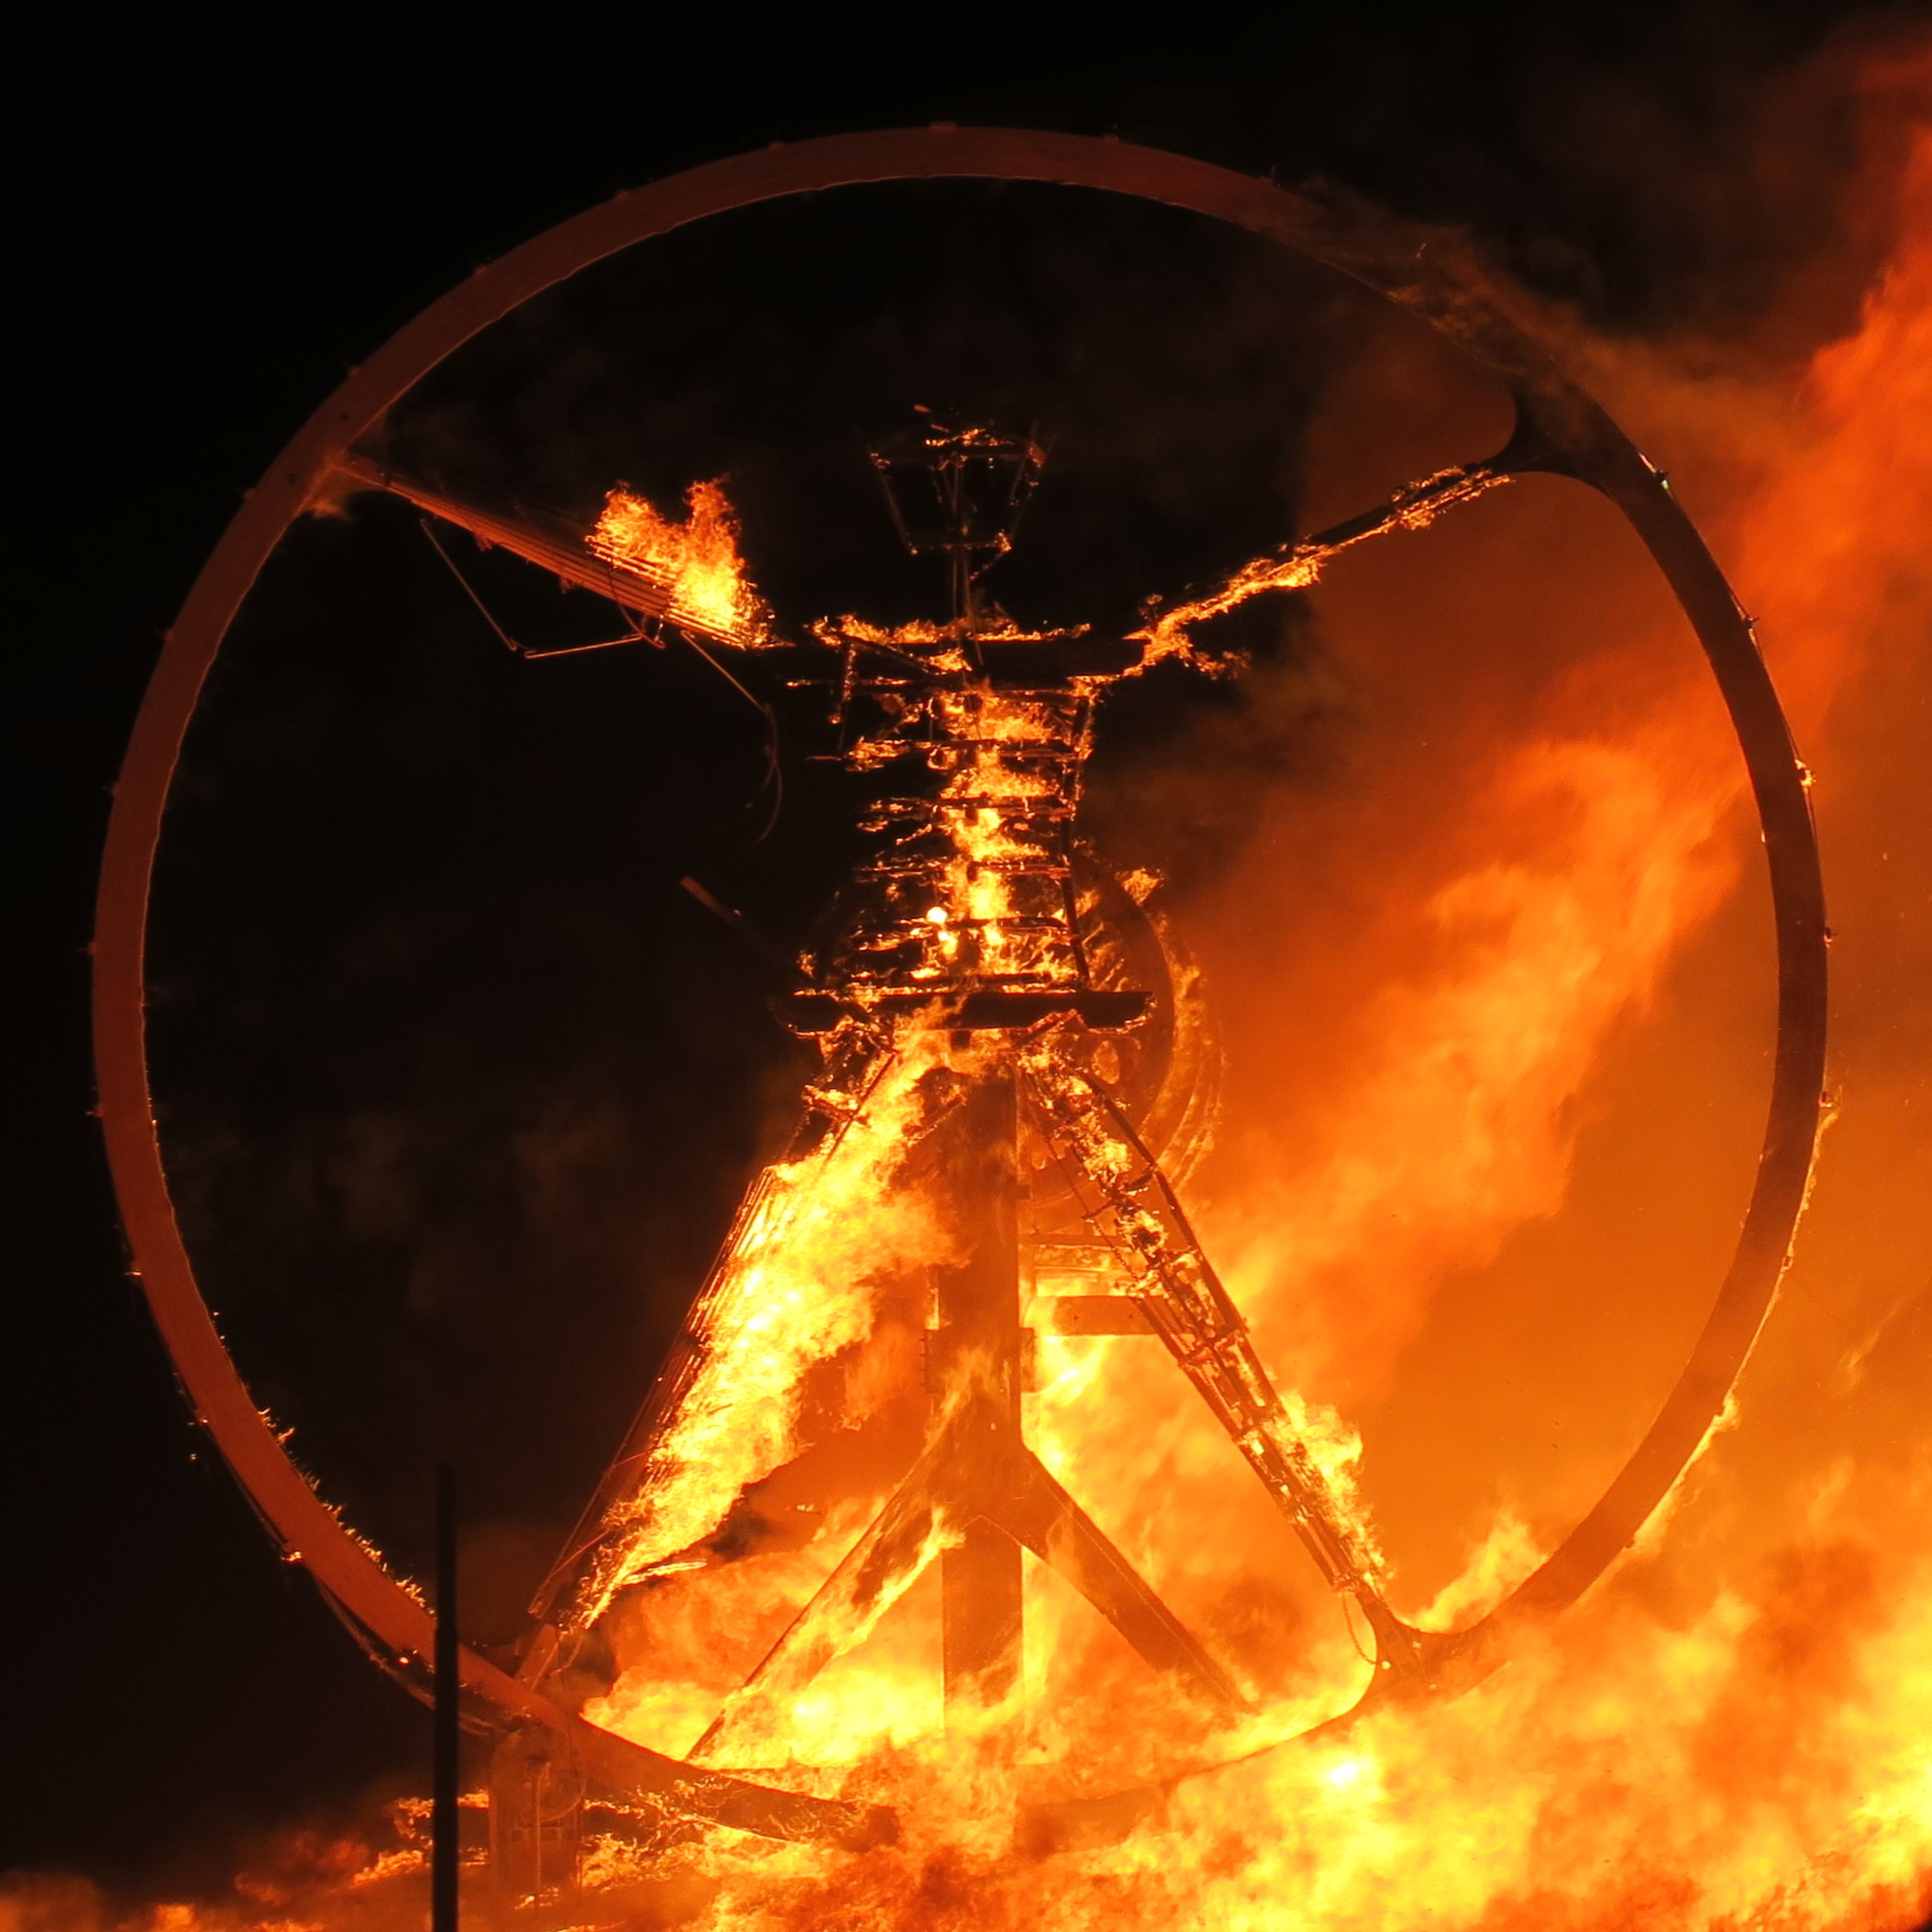 File:Burning Man 2016 Fire Nights 274 (30257305881).jpg - Wikimedia Commons